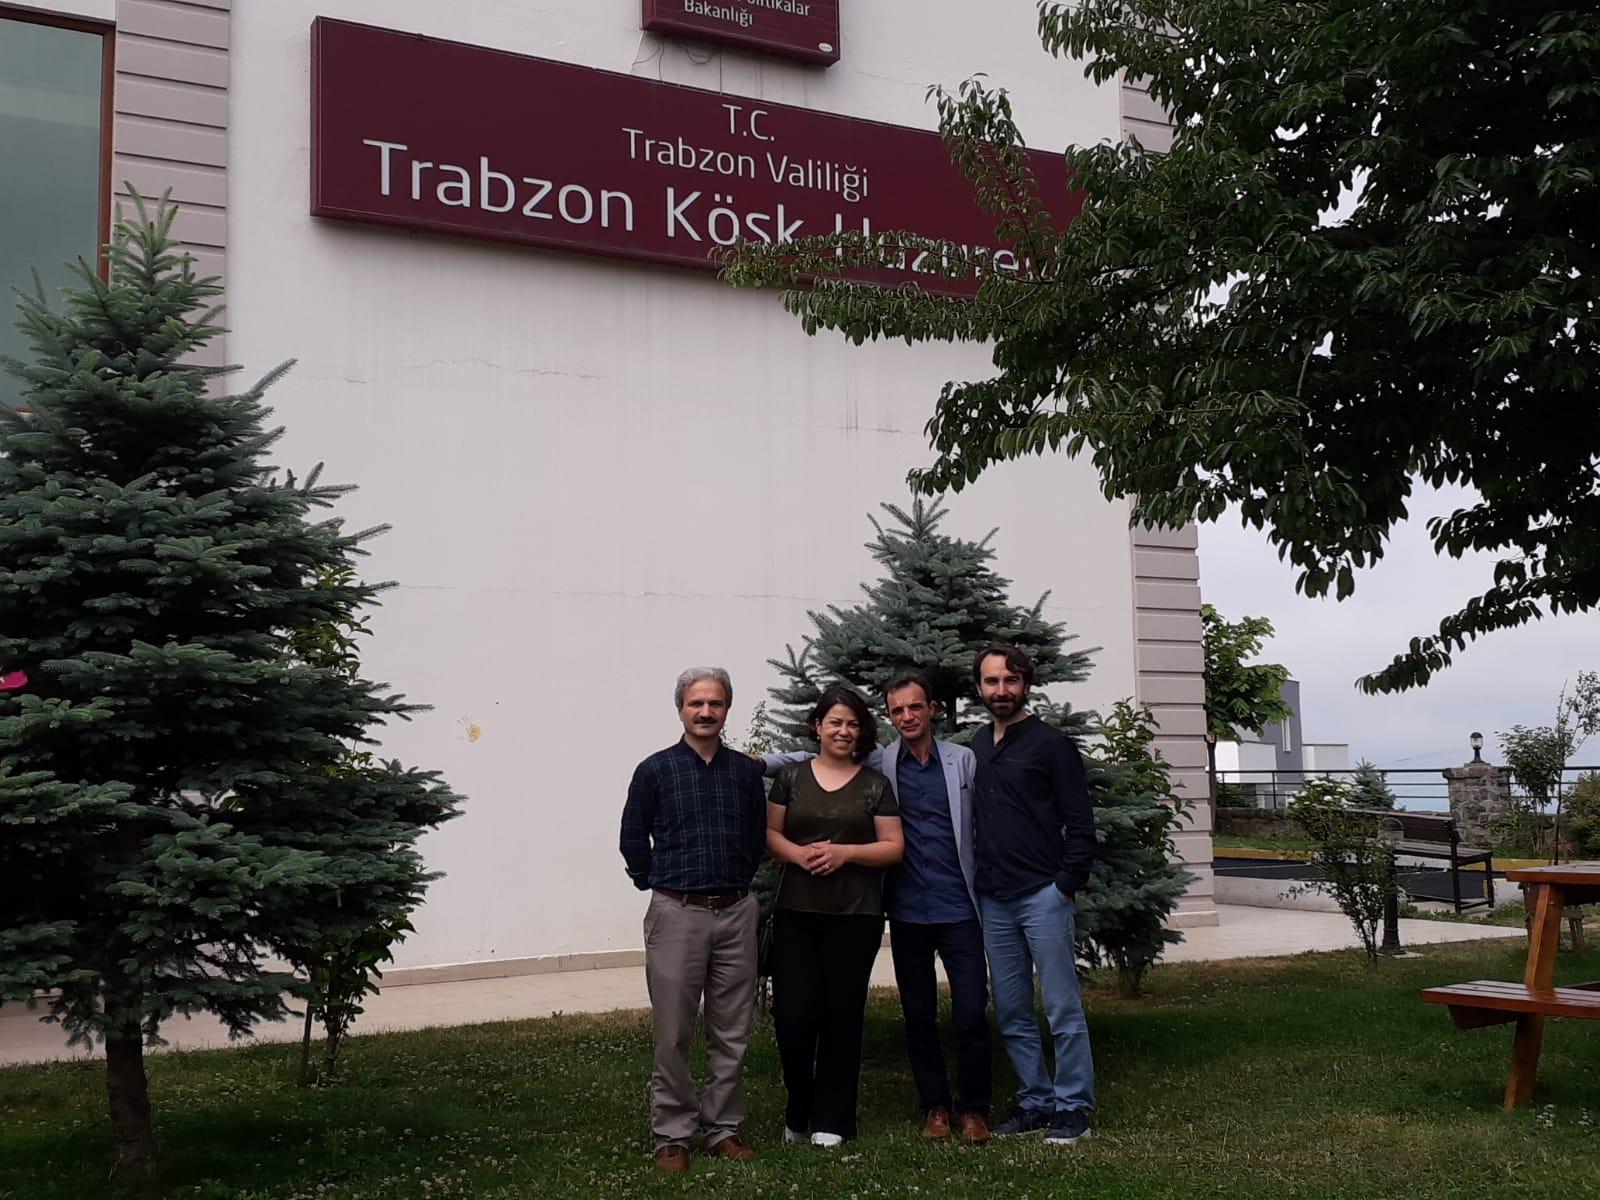 04.06.2019-tyb-trabzon-subesi-kosk-huzurevi-ziyareti-(4).jpg